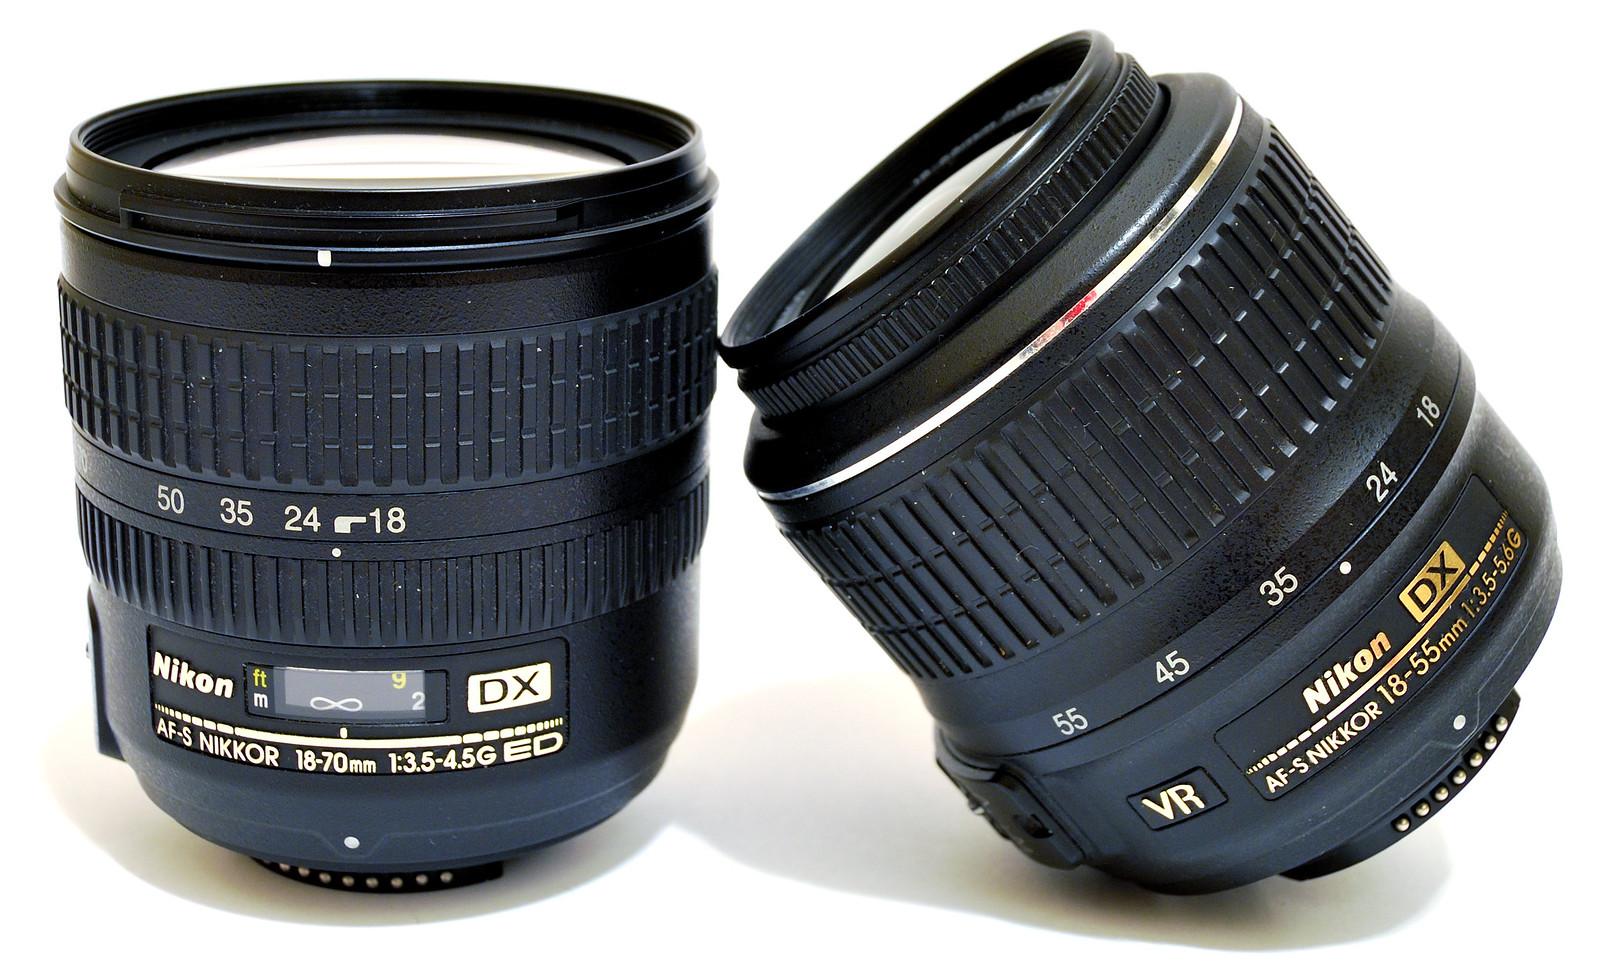 Nikon 18-55mm VS 18-70mm